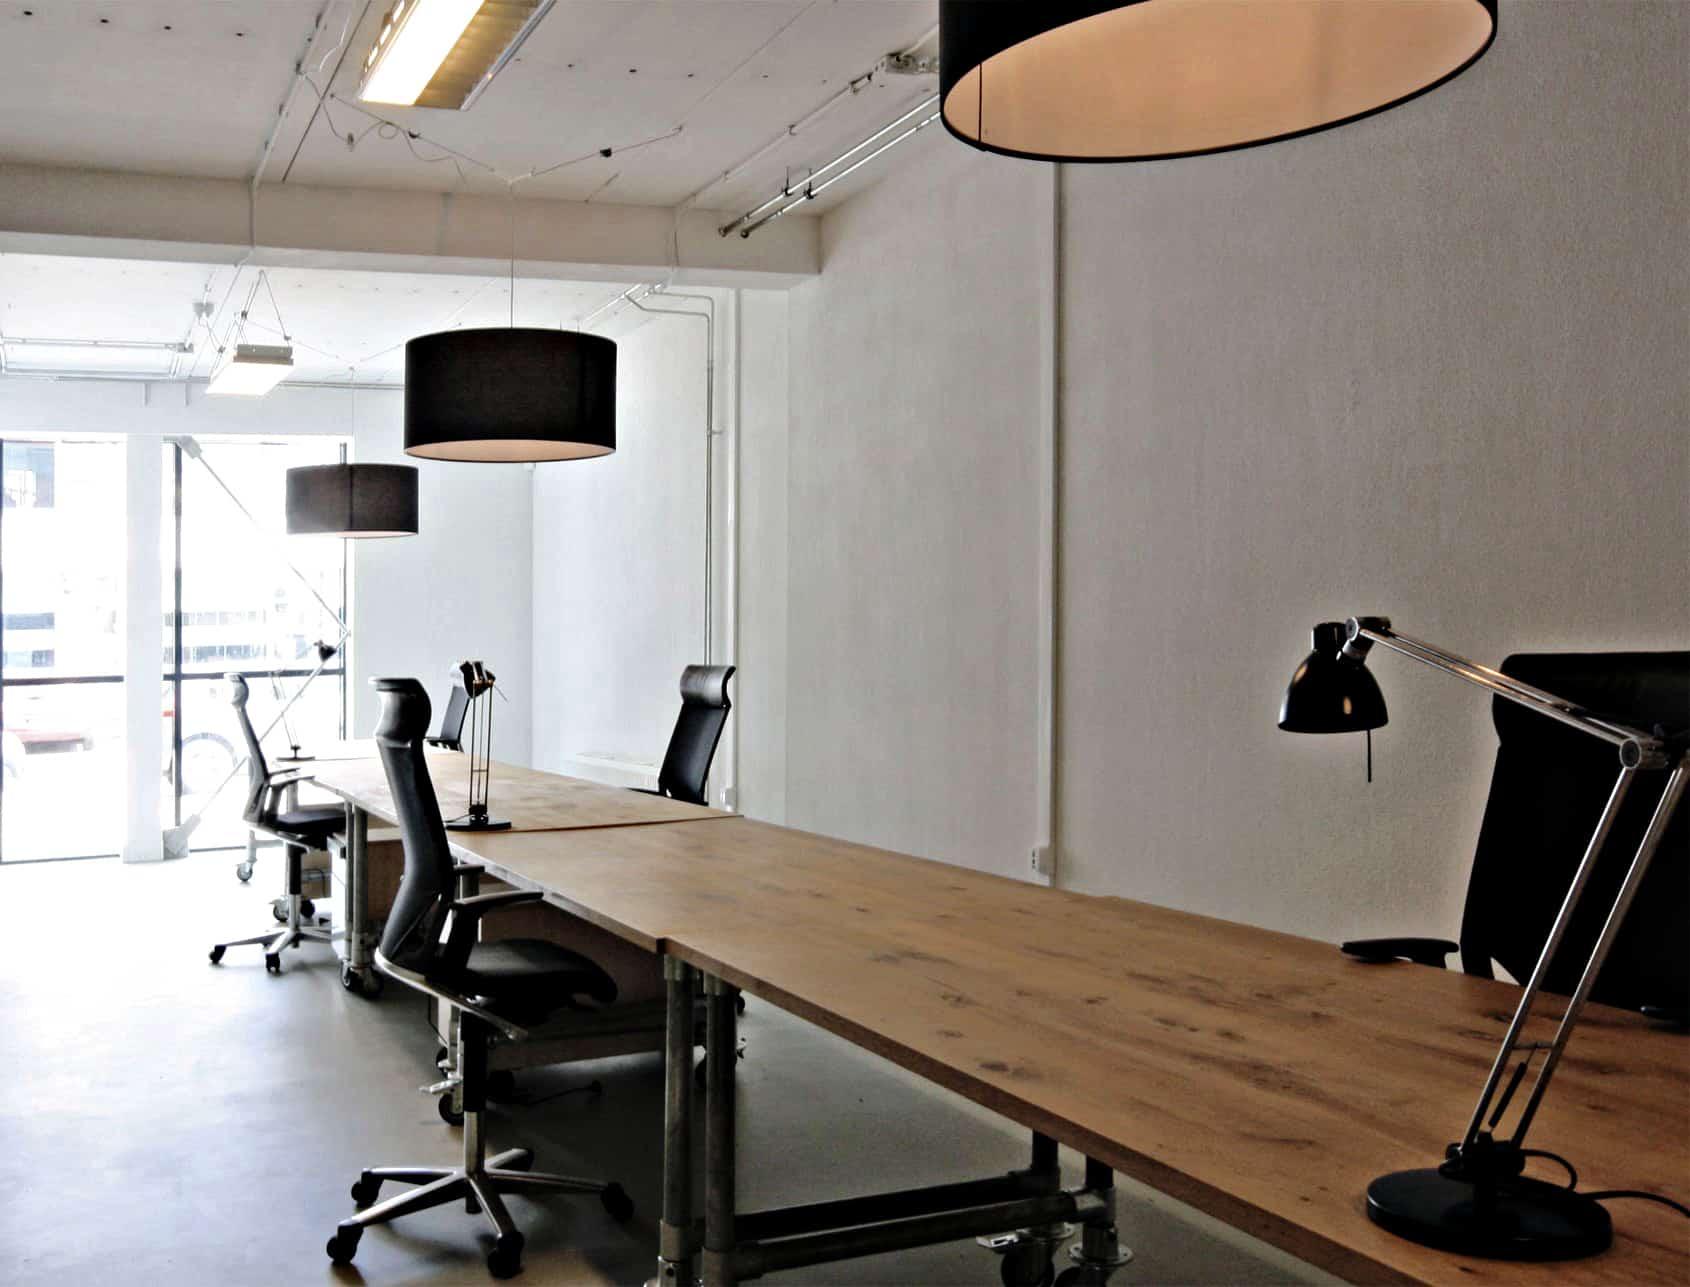 kleinschalige kantoorruimtes te huur amsterdam centraal station